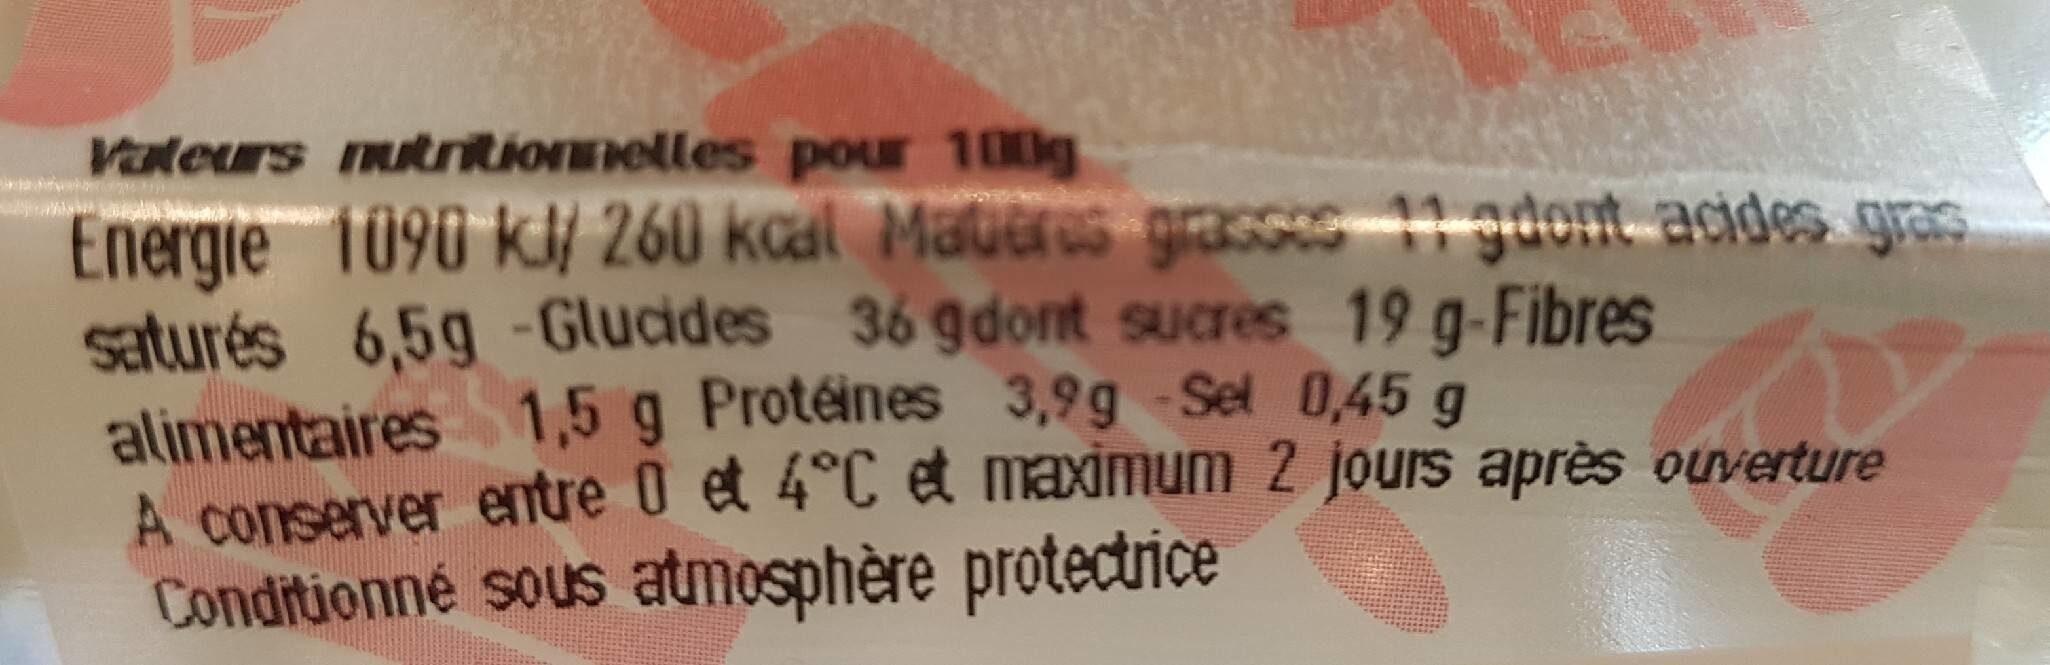 Éclair chocolat café - Valori nutrizionali - fr